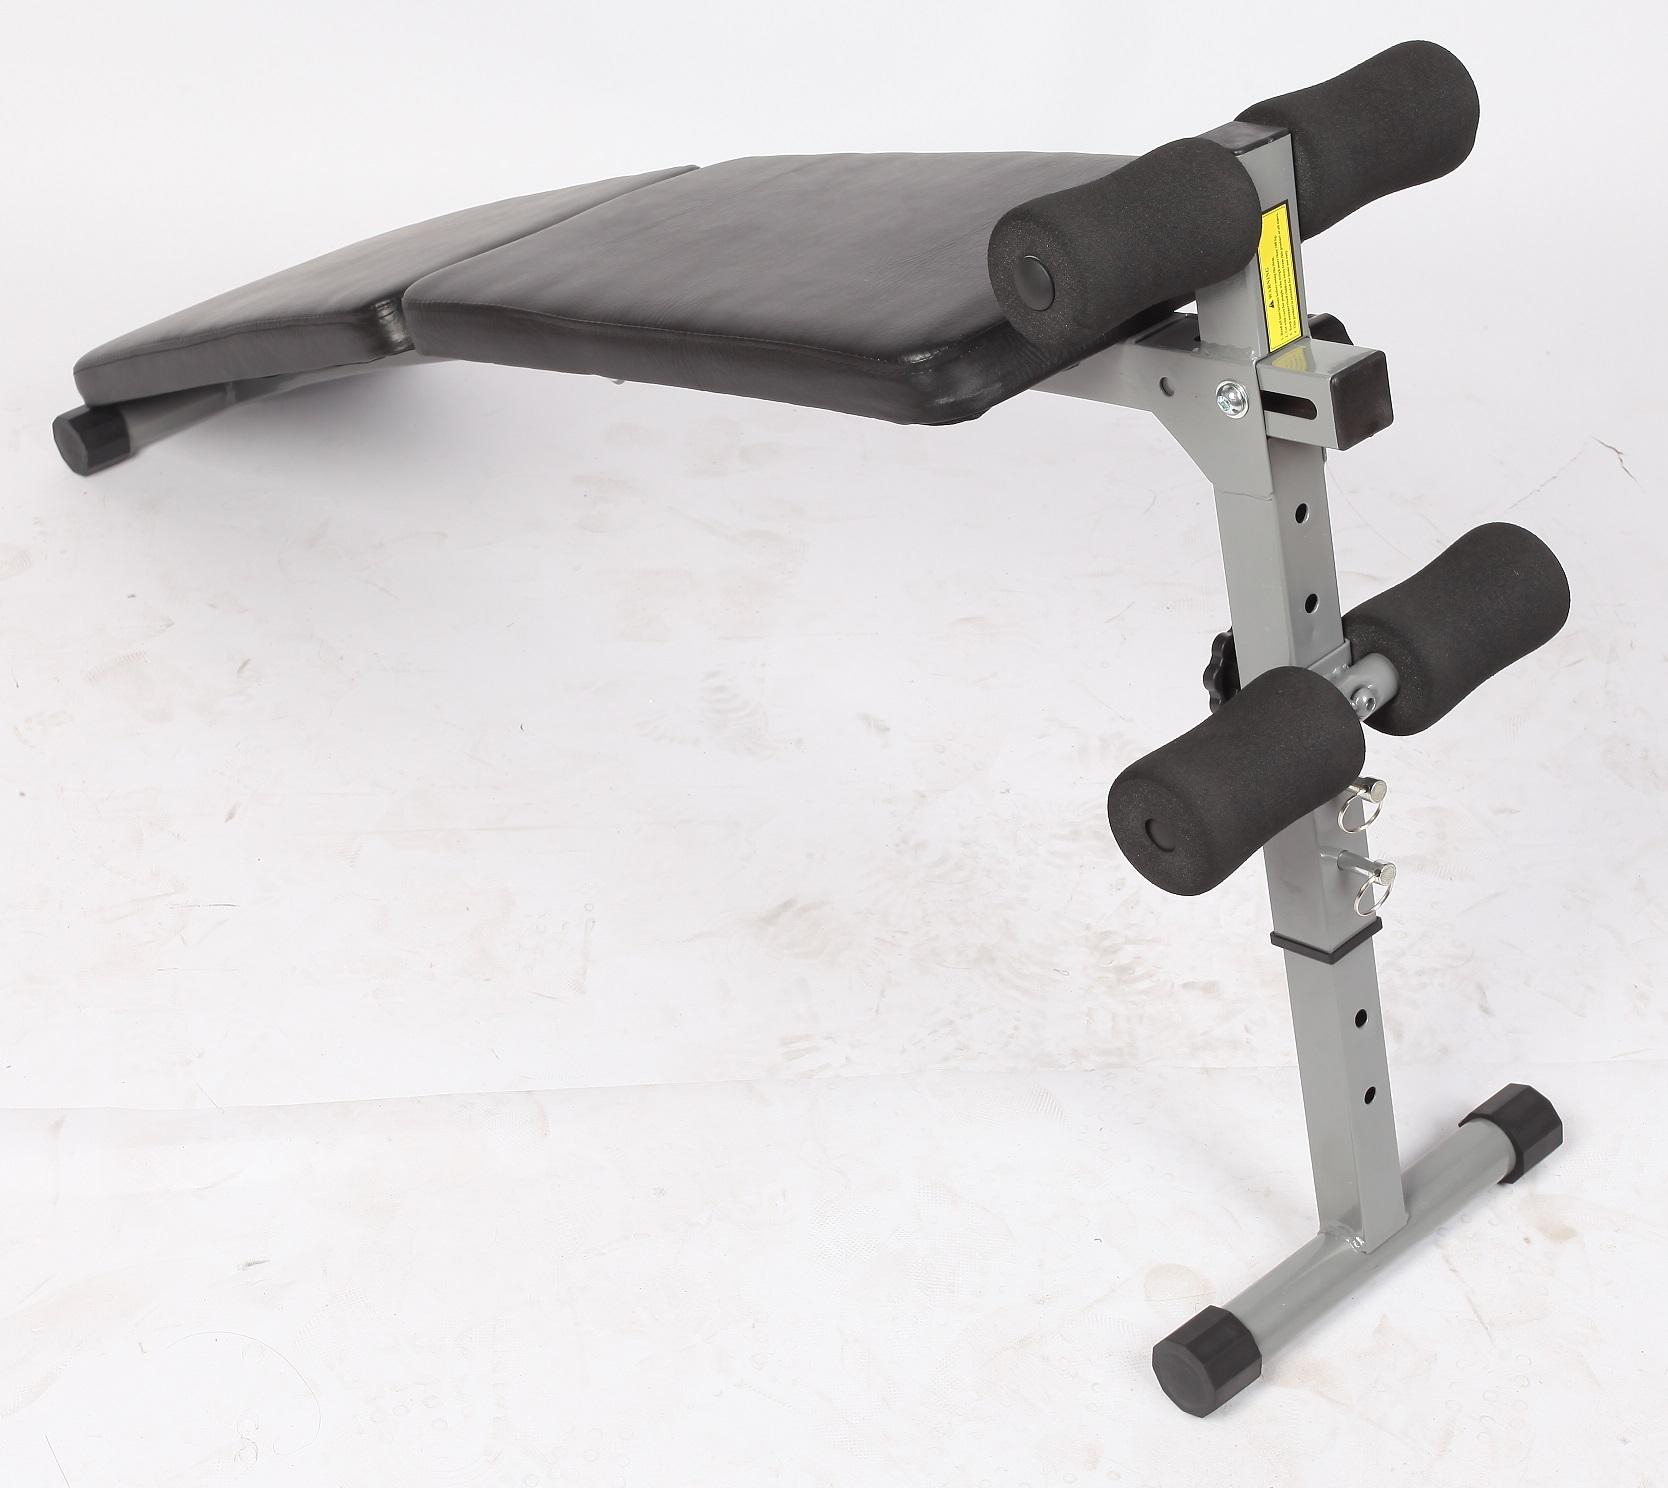 Adjustable Abdominal Crunch Sit Up Bench  Z2571